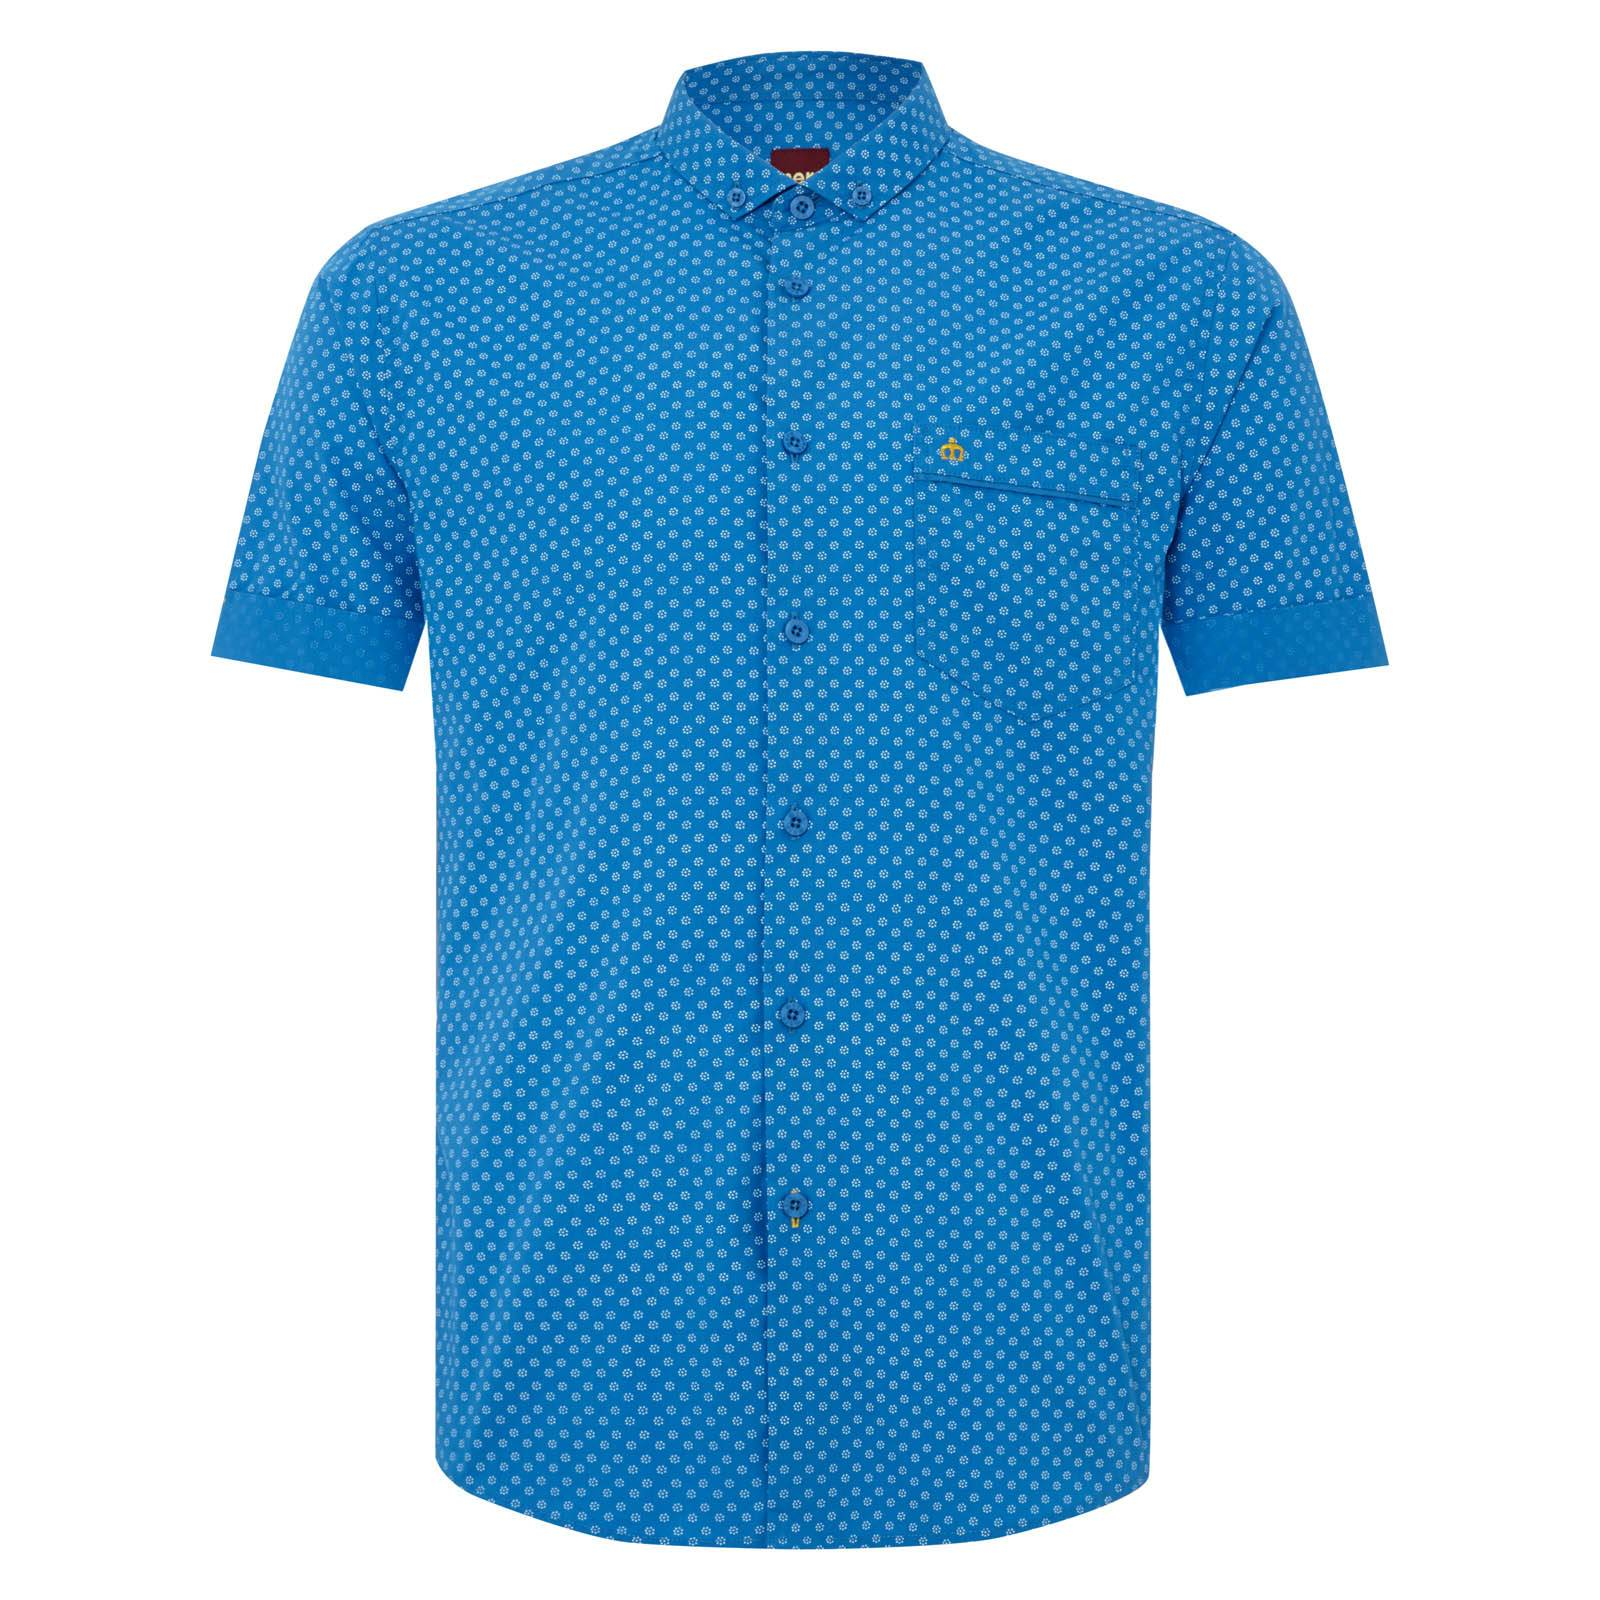 Рубашка Thorpe от MercLondon